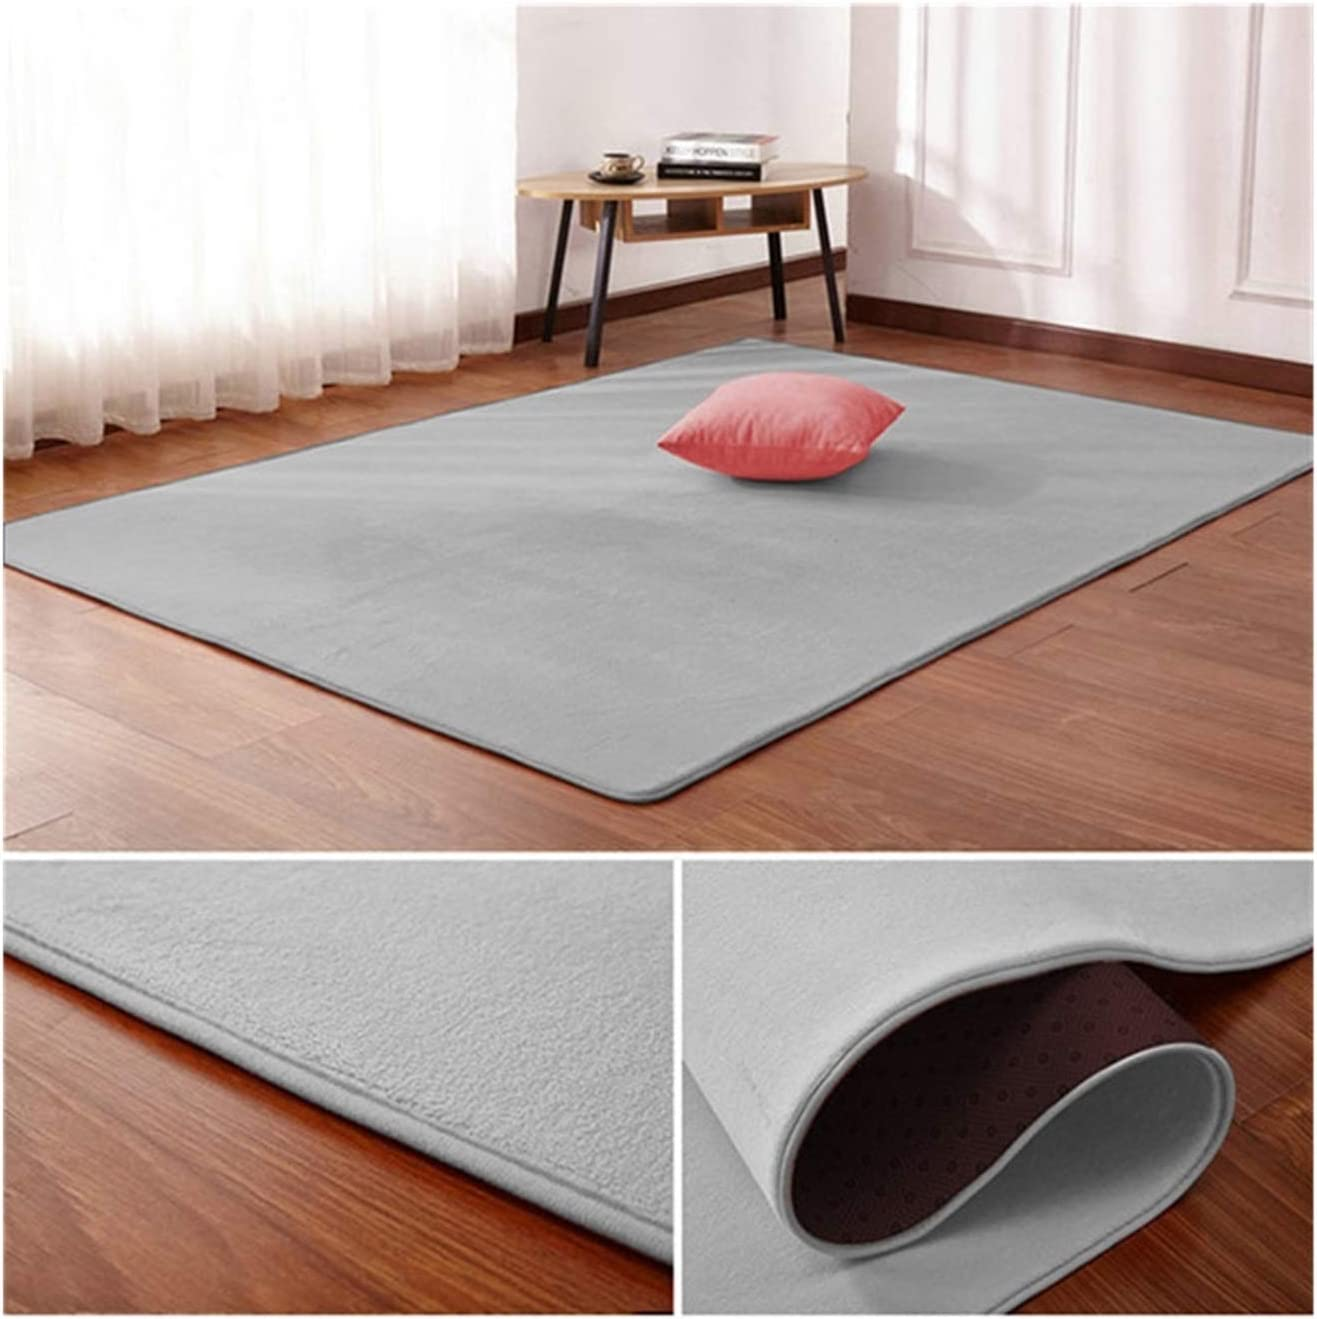 WAZG SYBLD Sale SALE% Ranking TOP7 OFF Nordic Coral Velvet Carpet Bedr Floor Room Living Mat